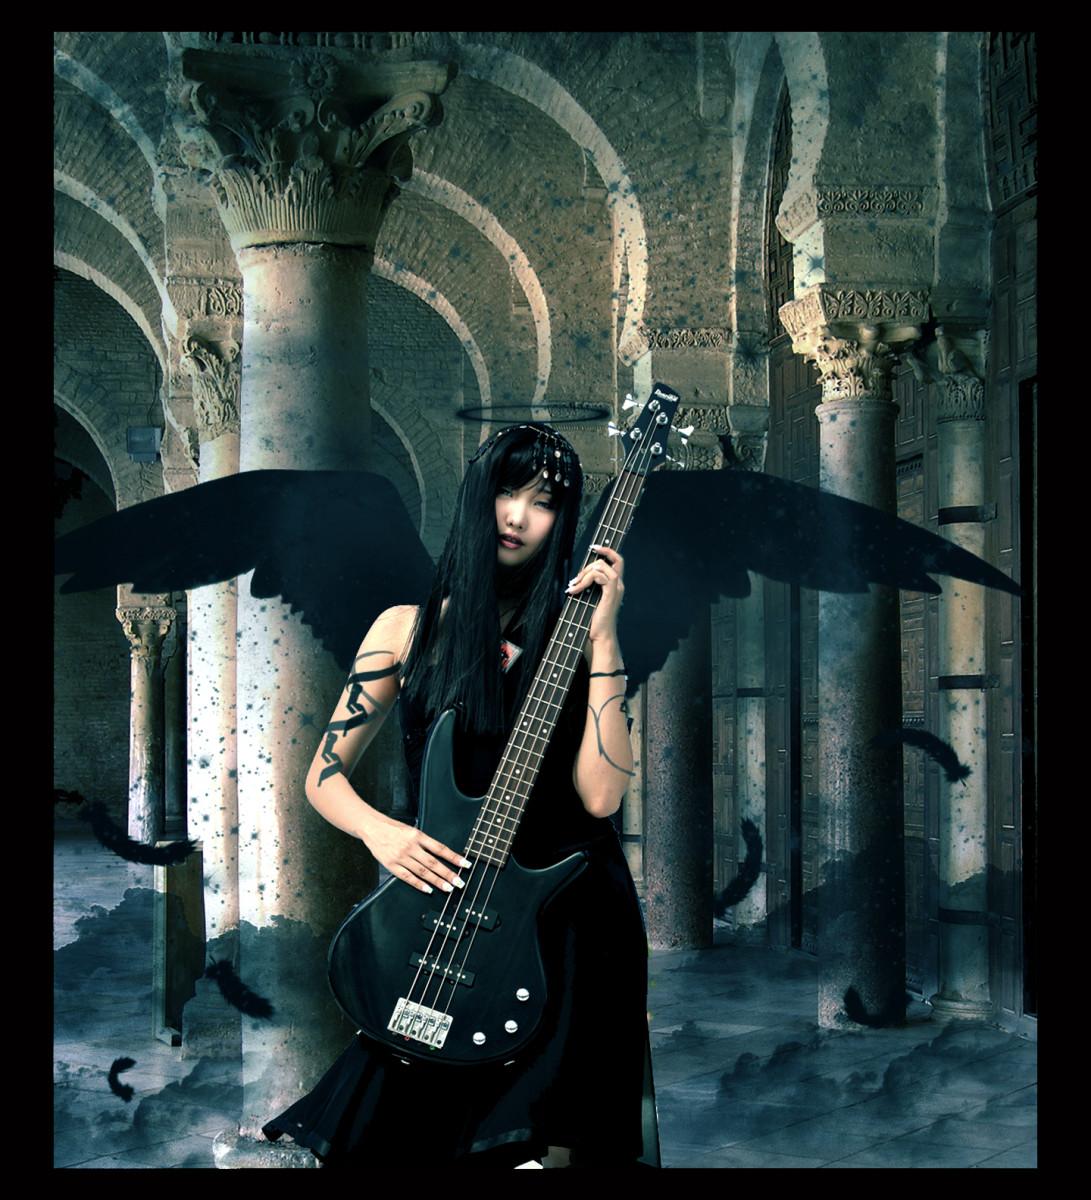 bass guitar wallpaper. this Gothic wallpaper was